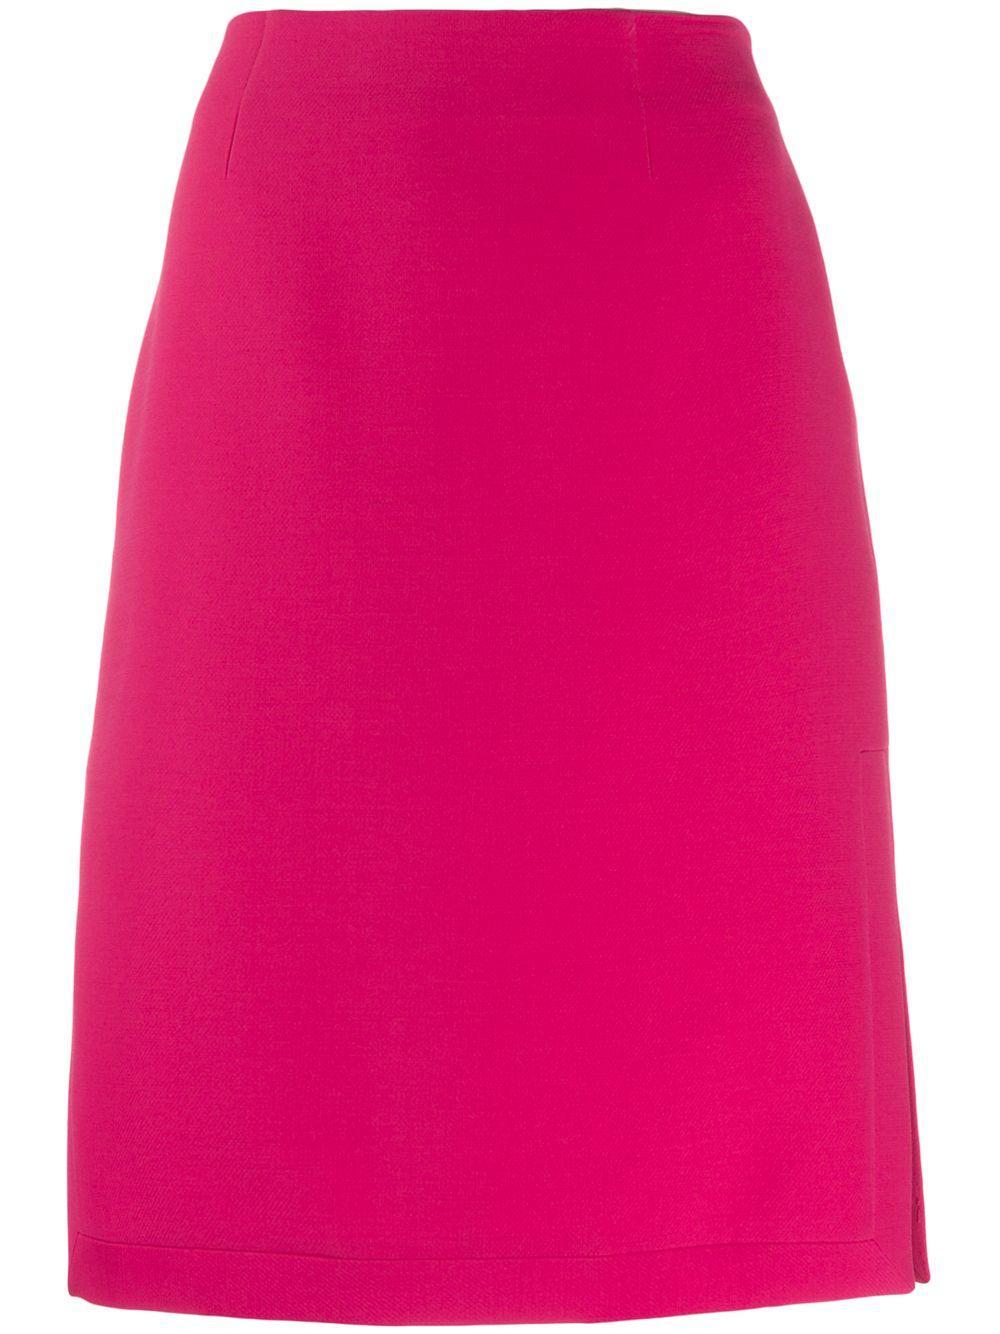 Emilio Pucci юбка-карандаш с боковым разрезом